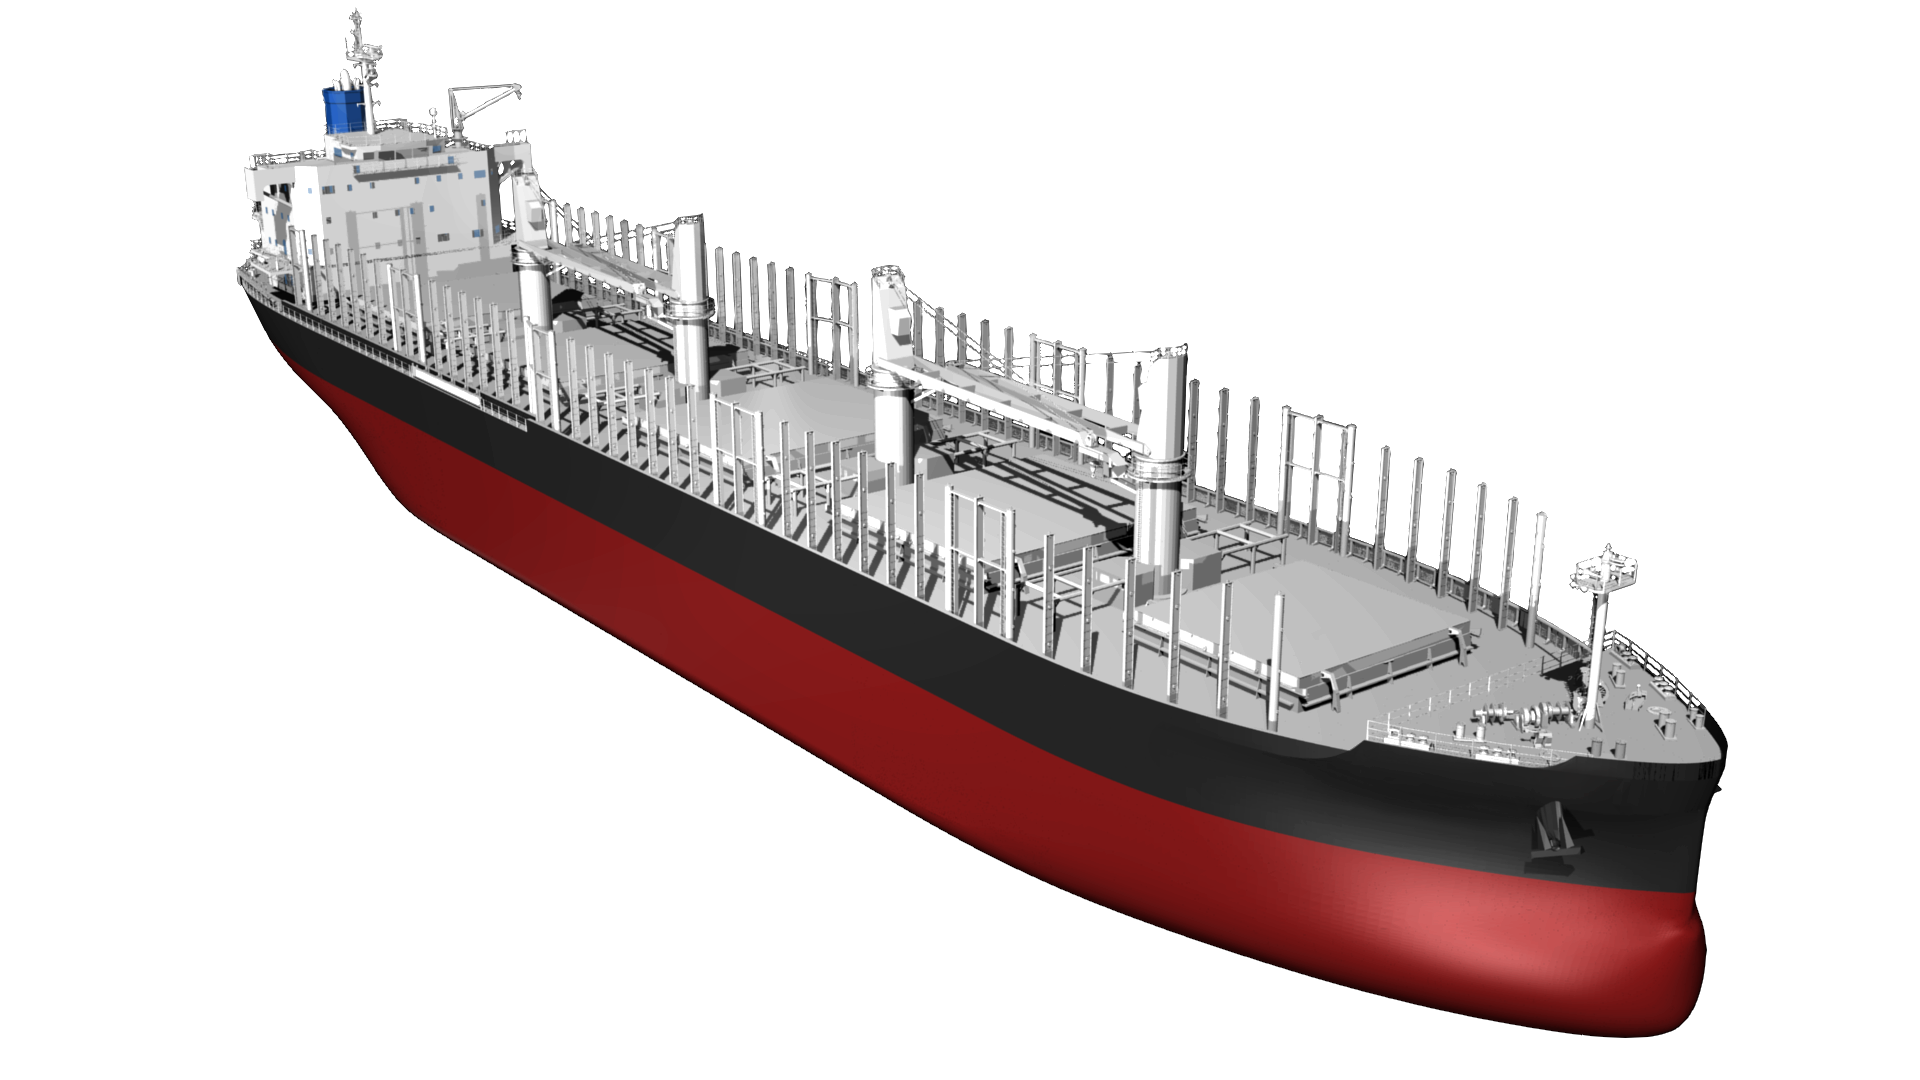 Cargo Ship PNG HD Transparent Cargo Ship HD.PNG Images.